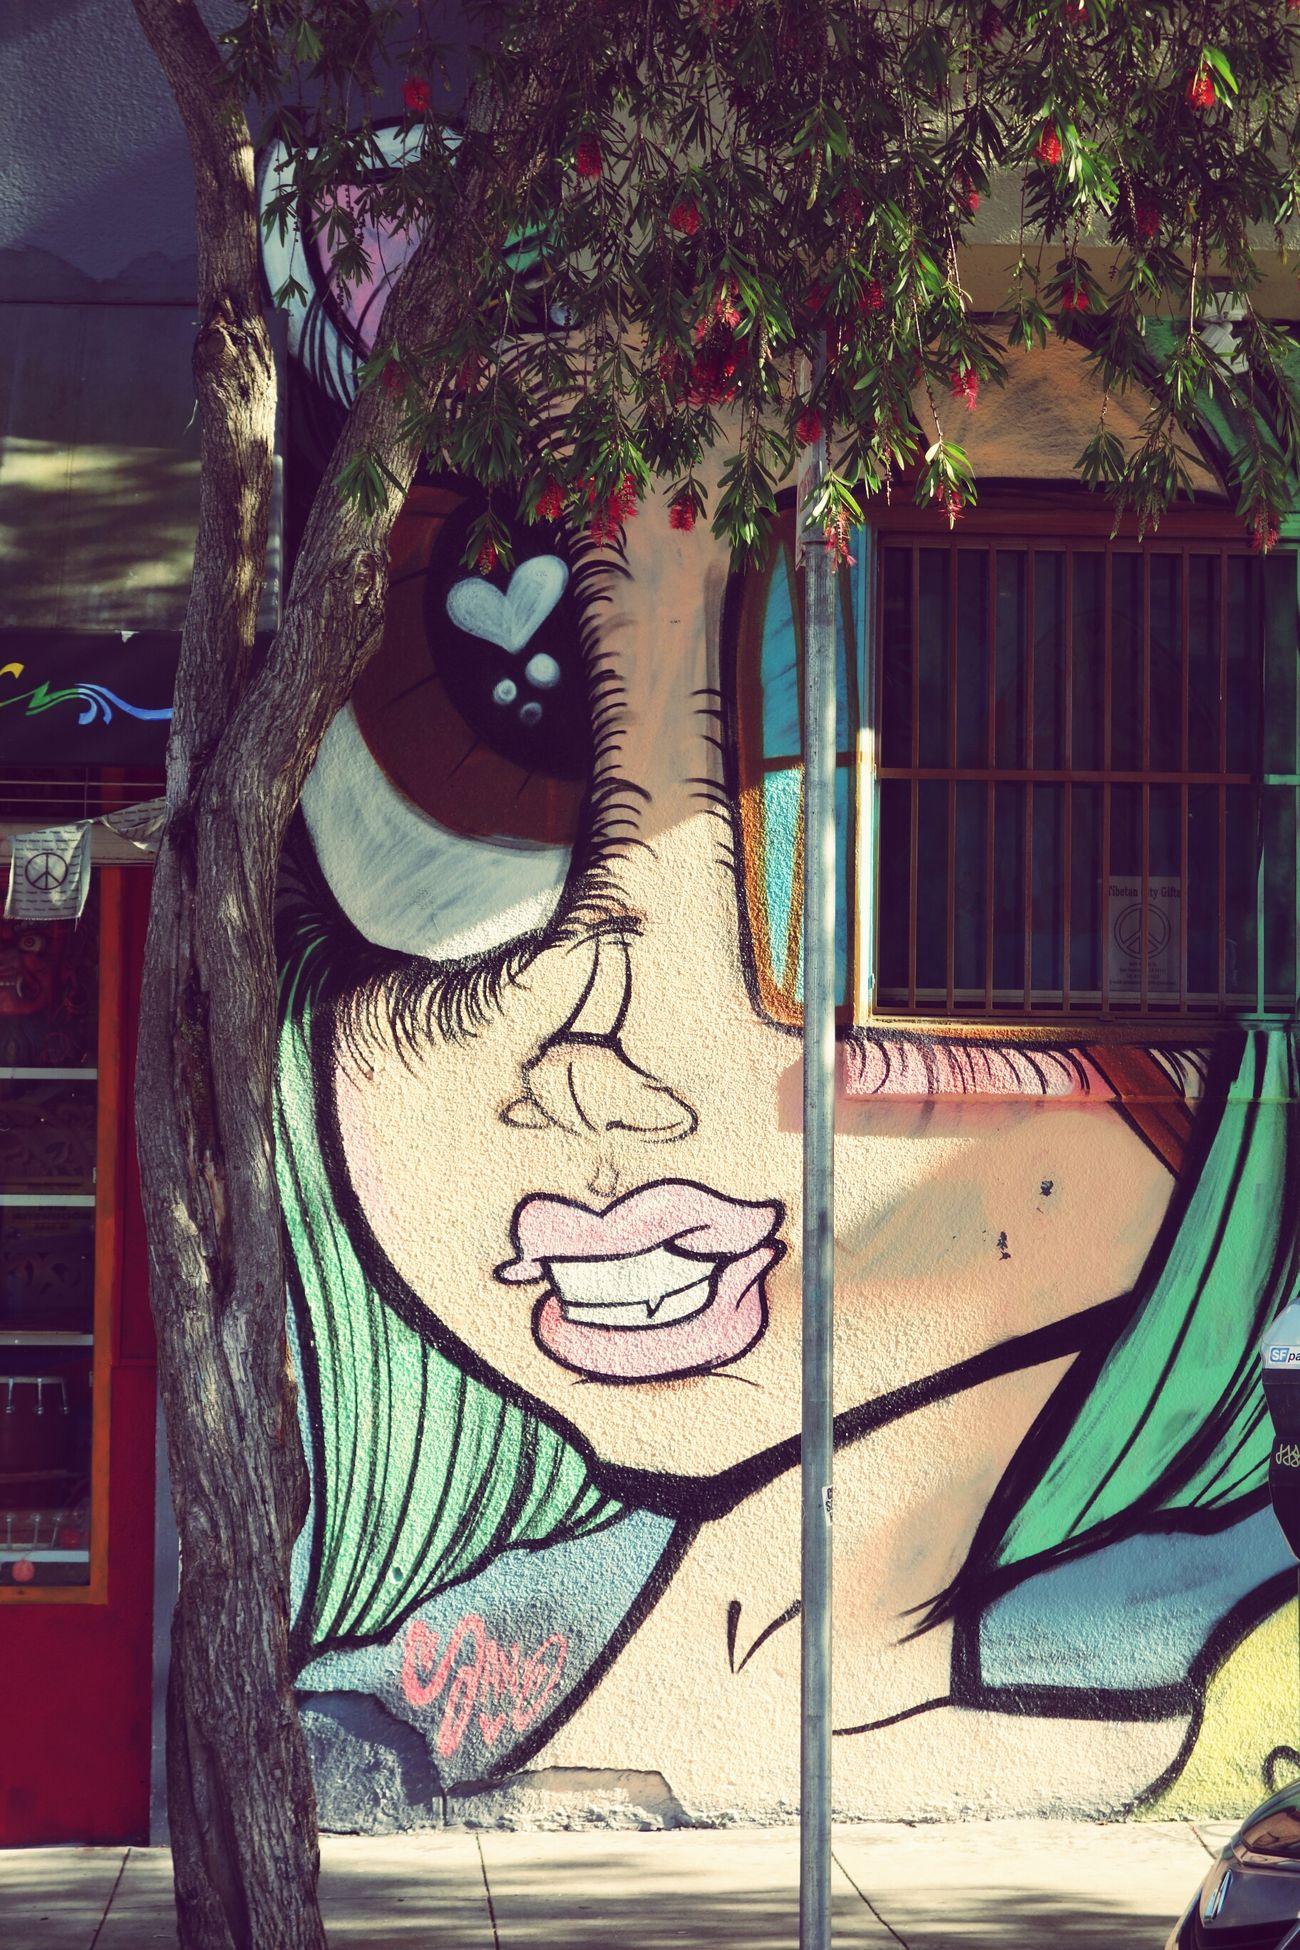 Color Photography Streetphotography Graffiti California Tree Outdoors Eyeemphotography Day Cartoon Manga Girl Big Eyes